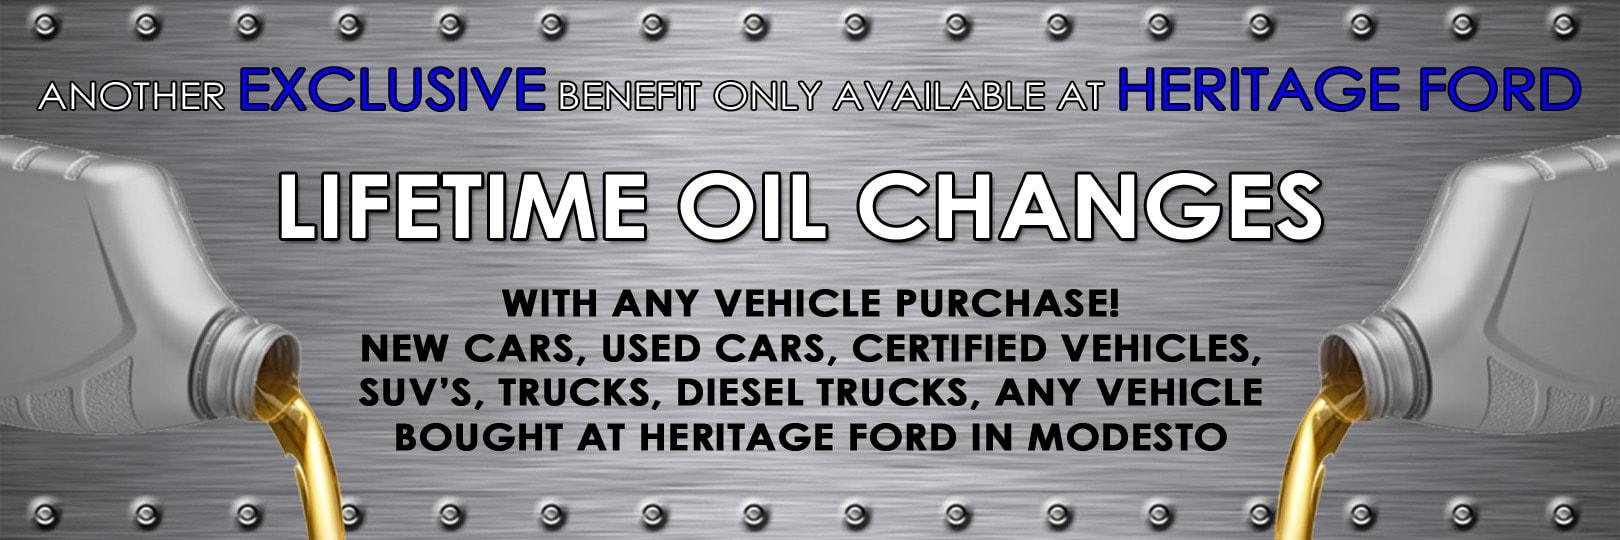 ford diesel oil change schedule best photos of diesel imagehut org. Black Bedroom Furniture Sets. Home Design Ideas